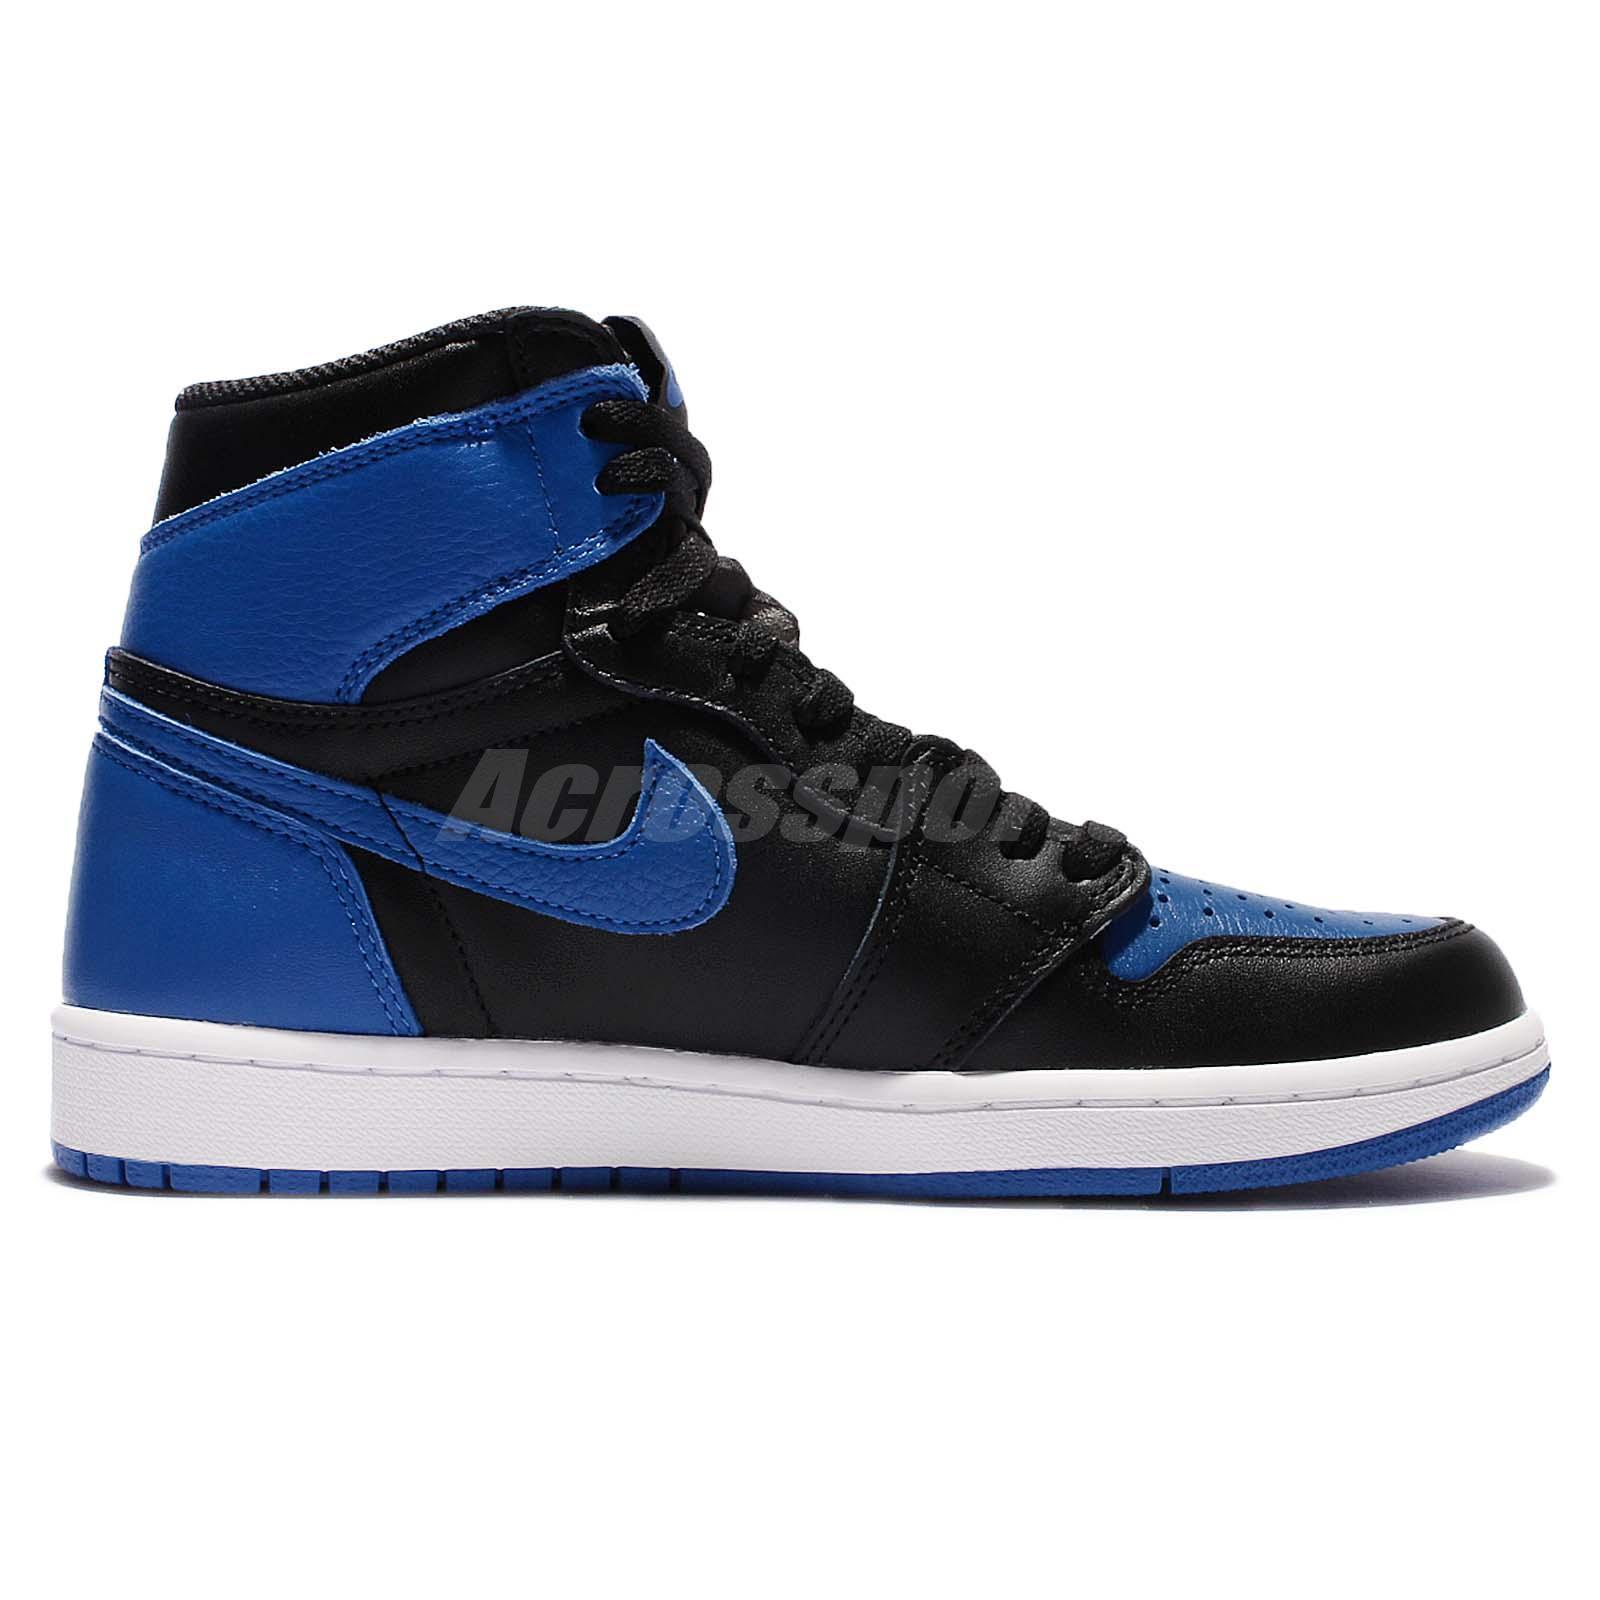 Basketball Shoes Before Jordan